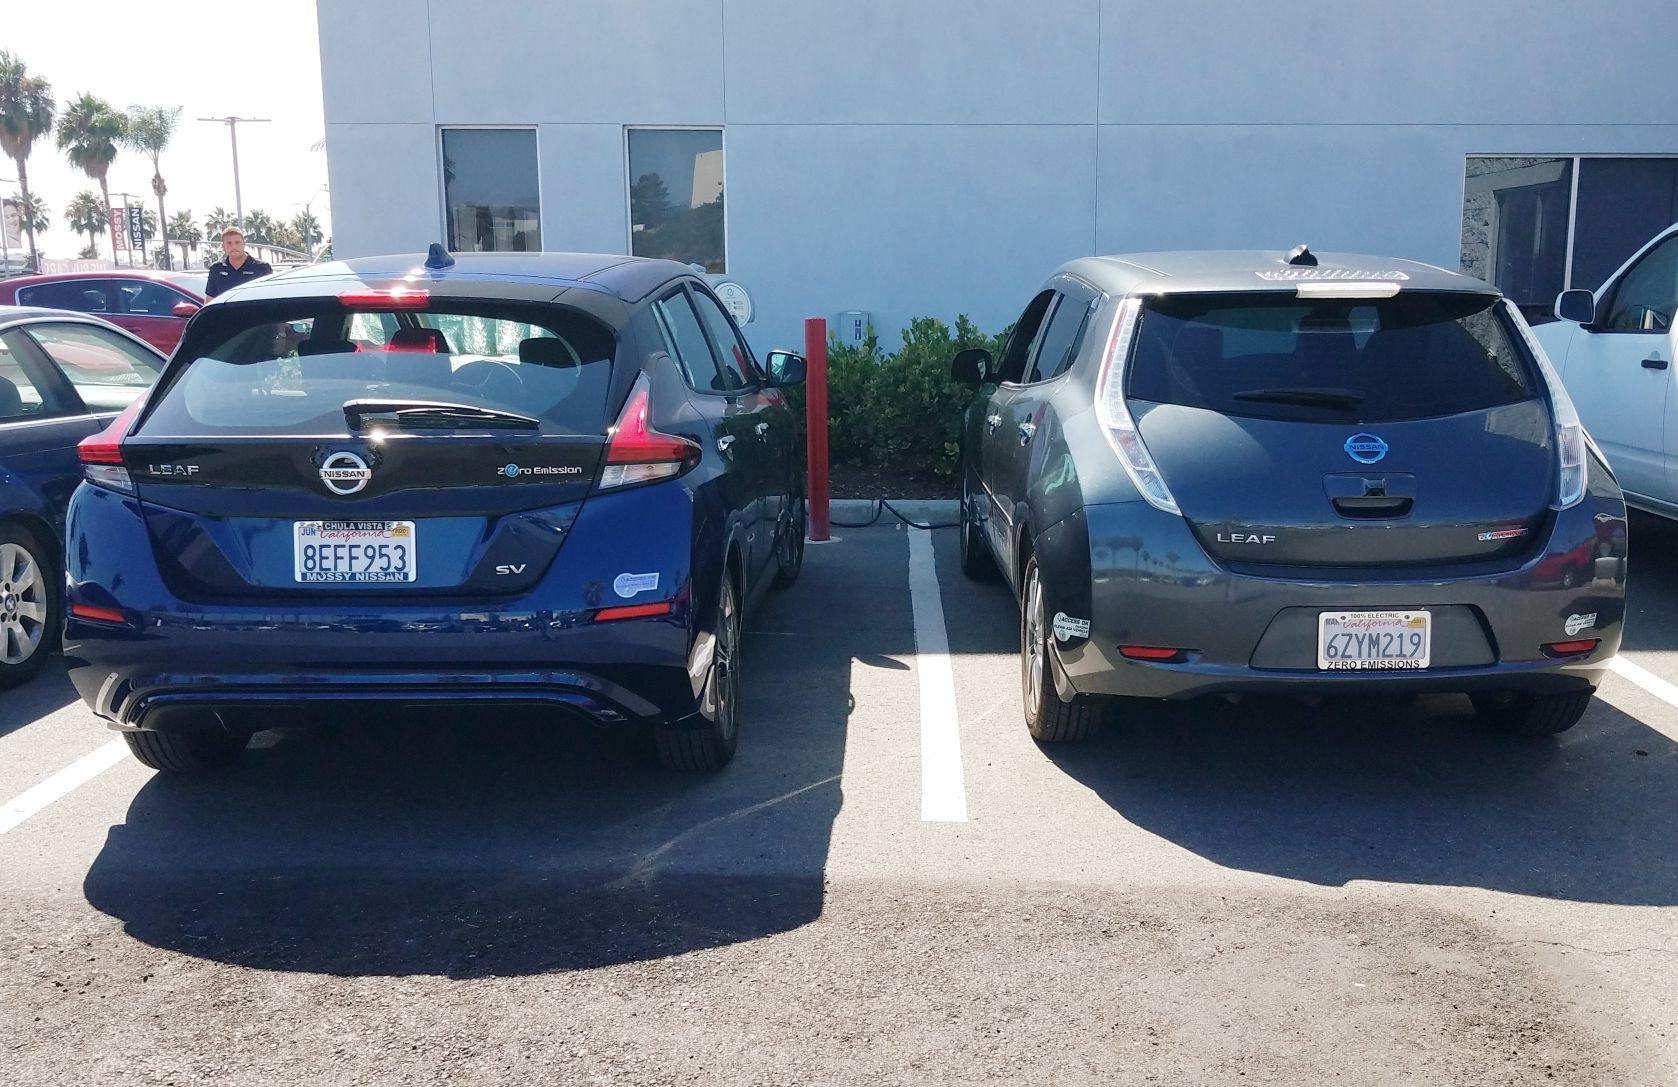 Mossy Nissan Chula Vista >> Mossy Nissan Chula Vista Plugshare